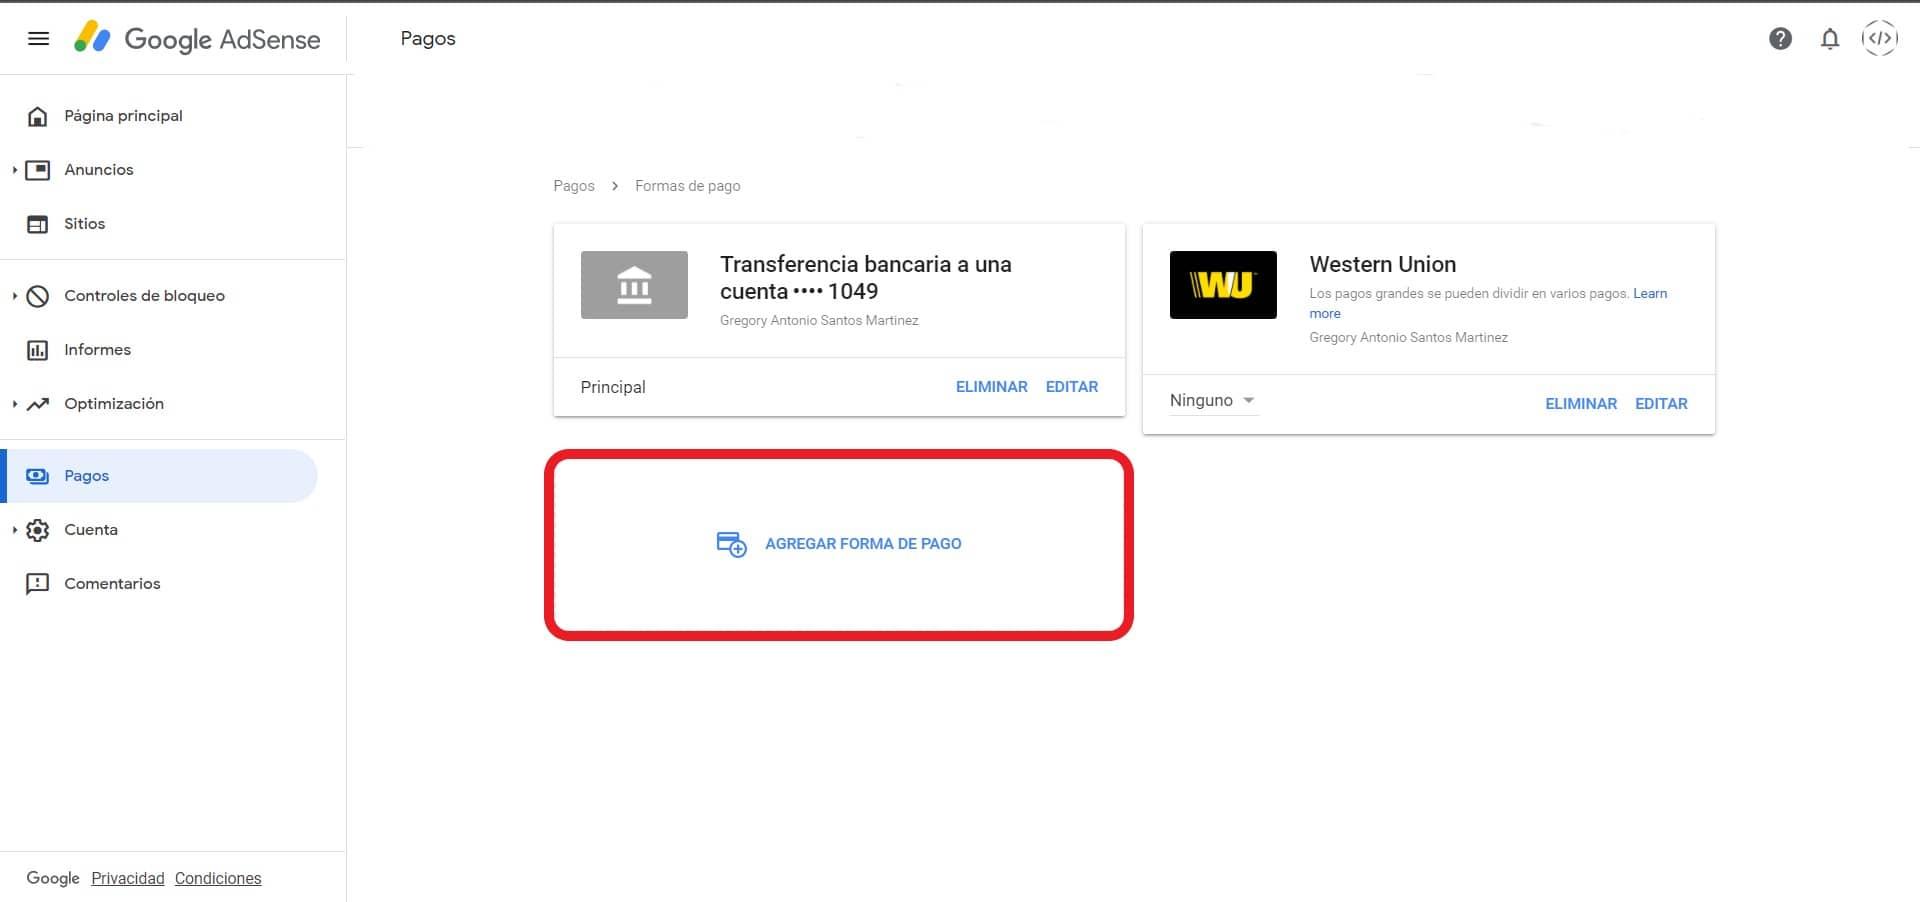 agregar forma de pago google adsense